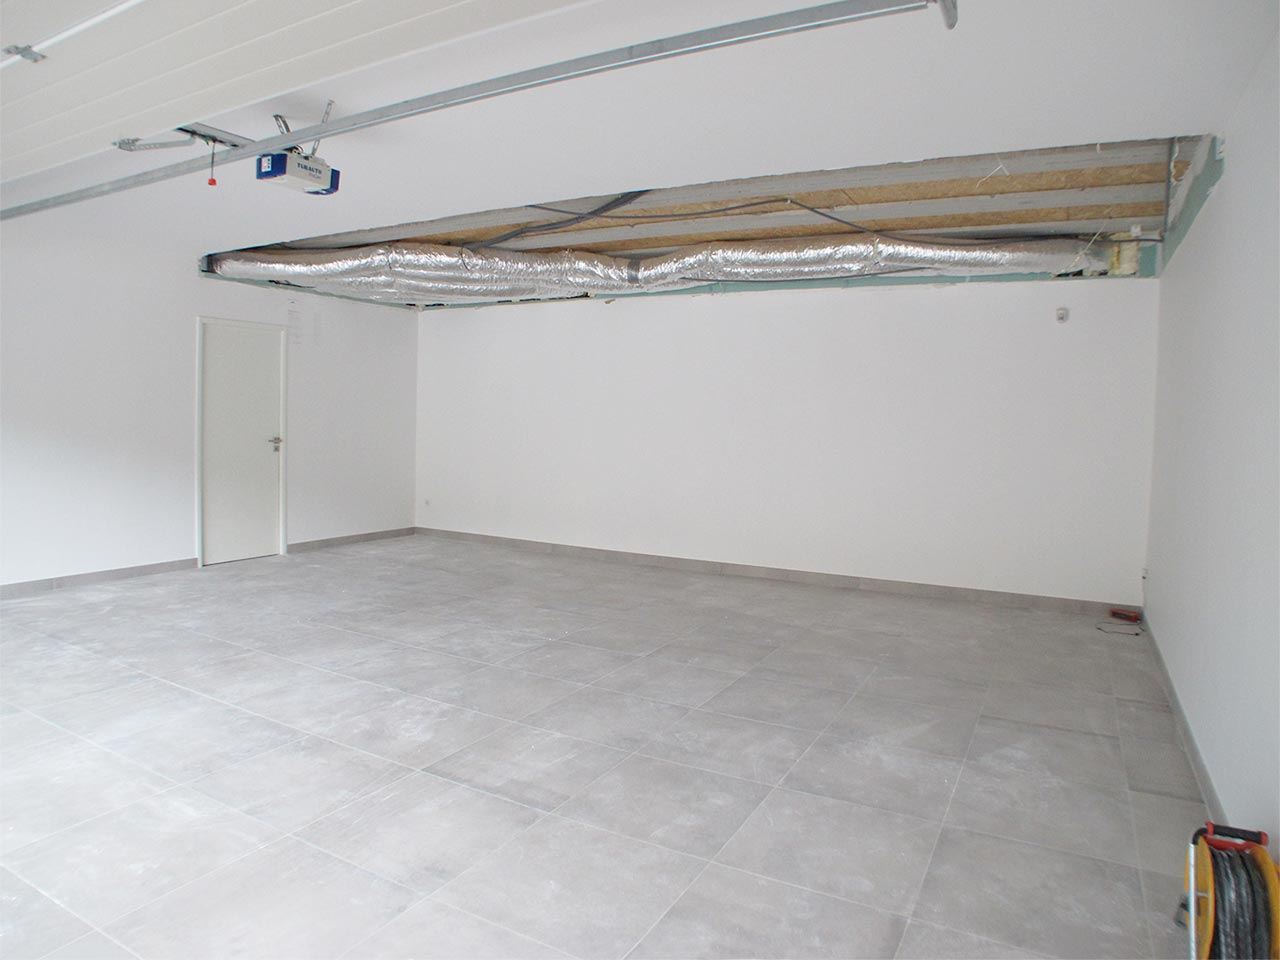 Garage haut de gamme lamborghini avant travaux